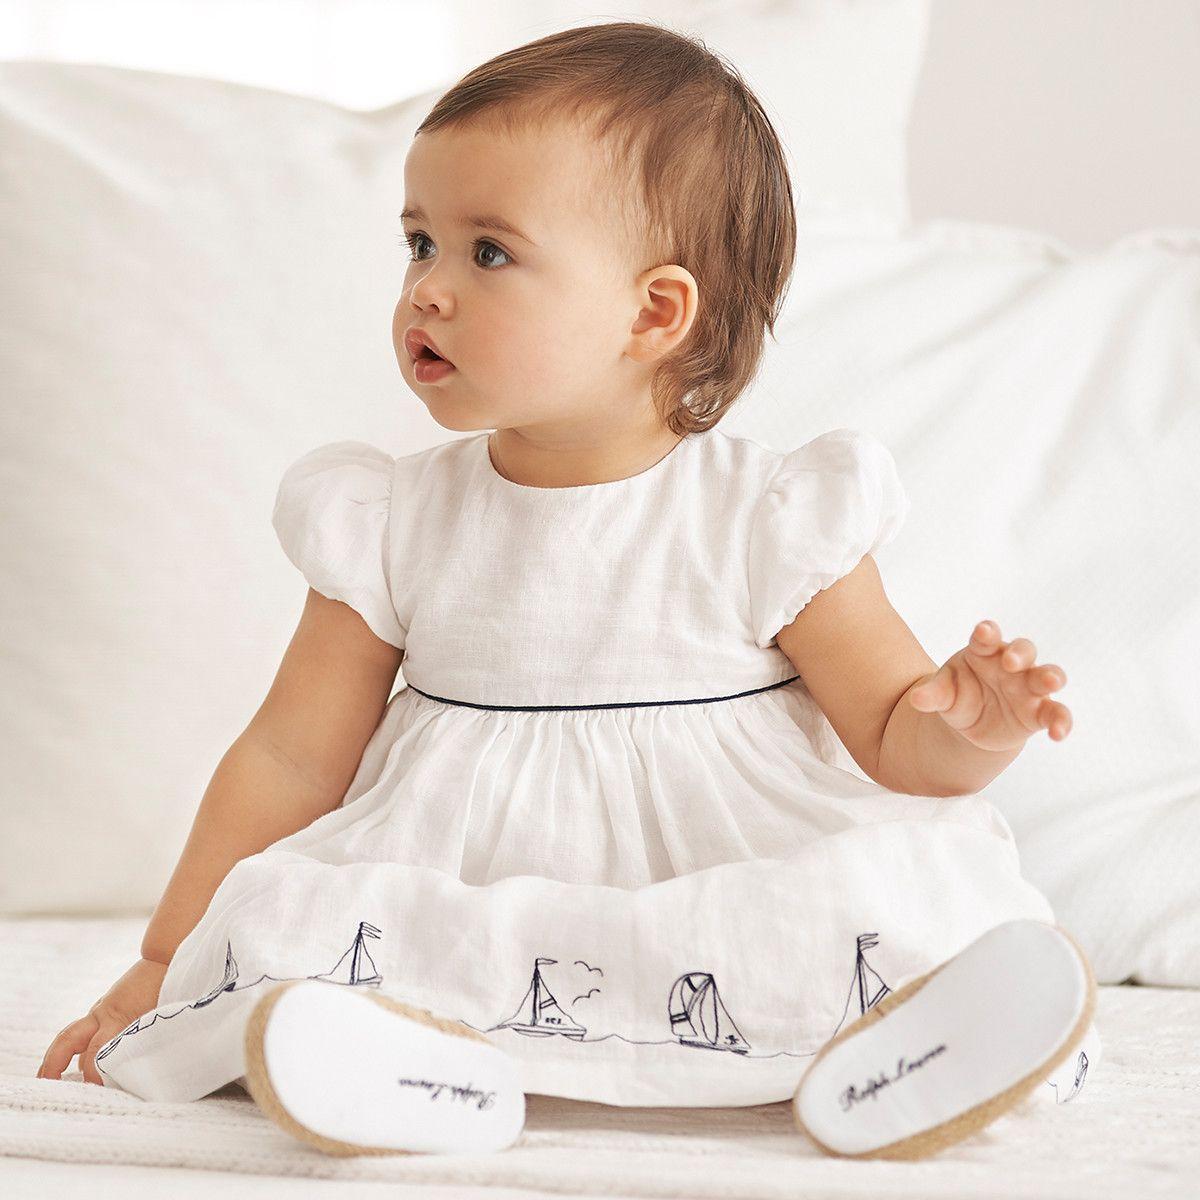 447400a7ec66 Ralph Lauren Baby Clothes   Polo - Macy s